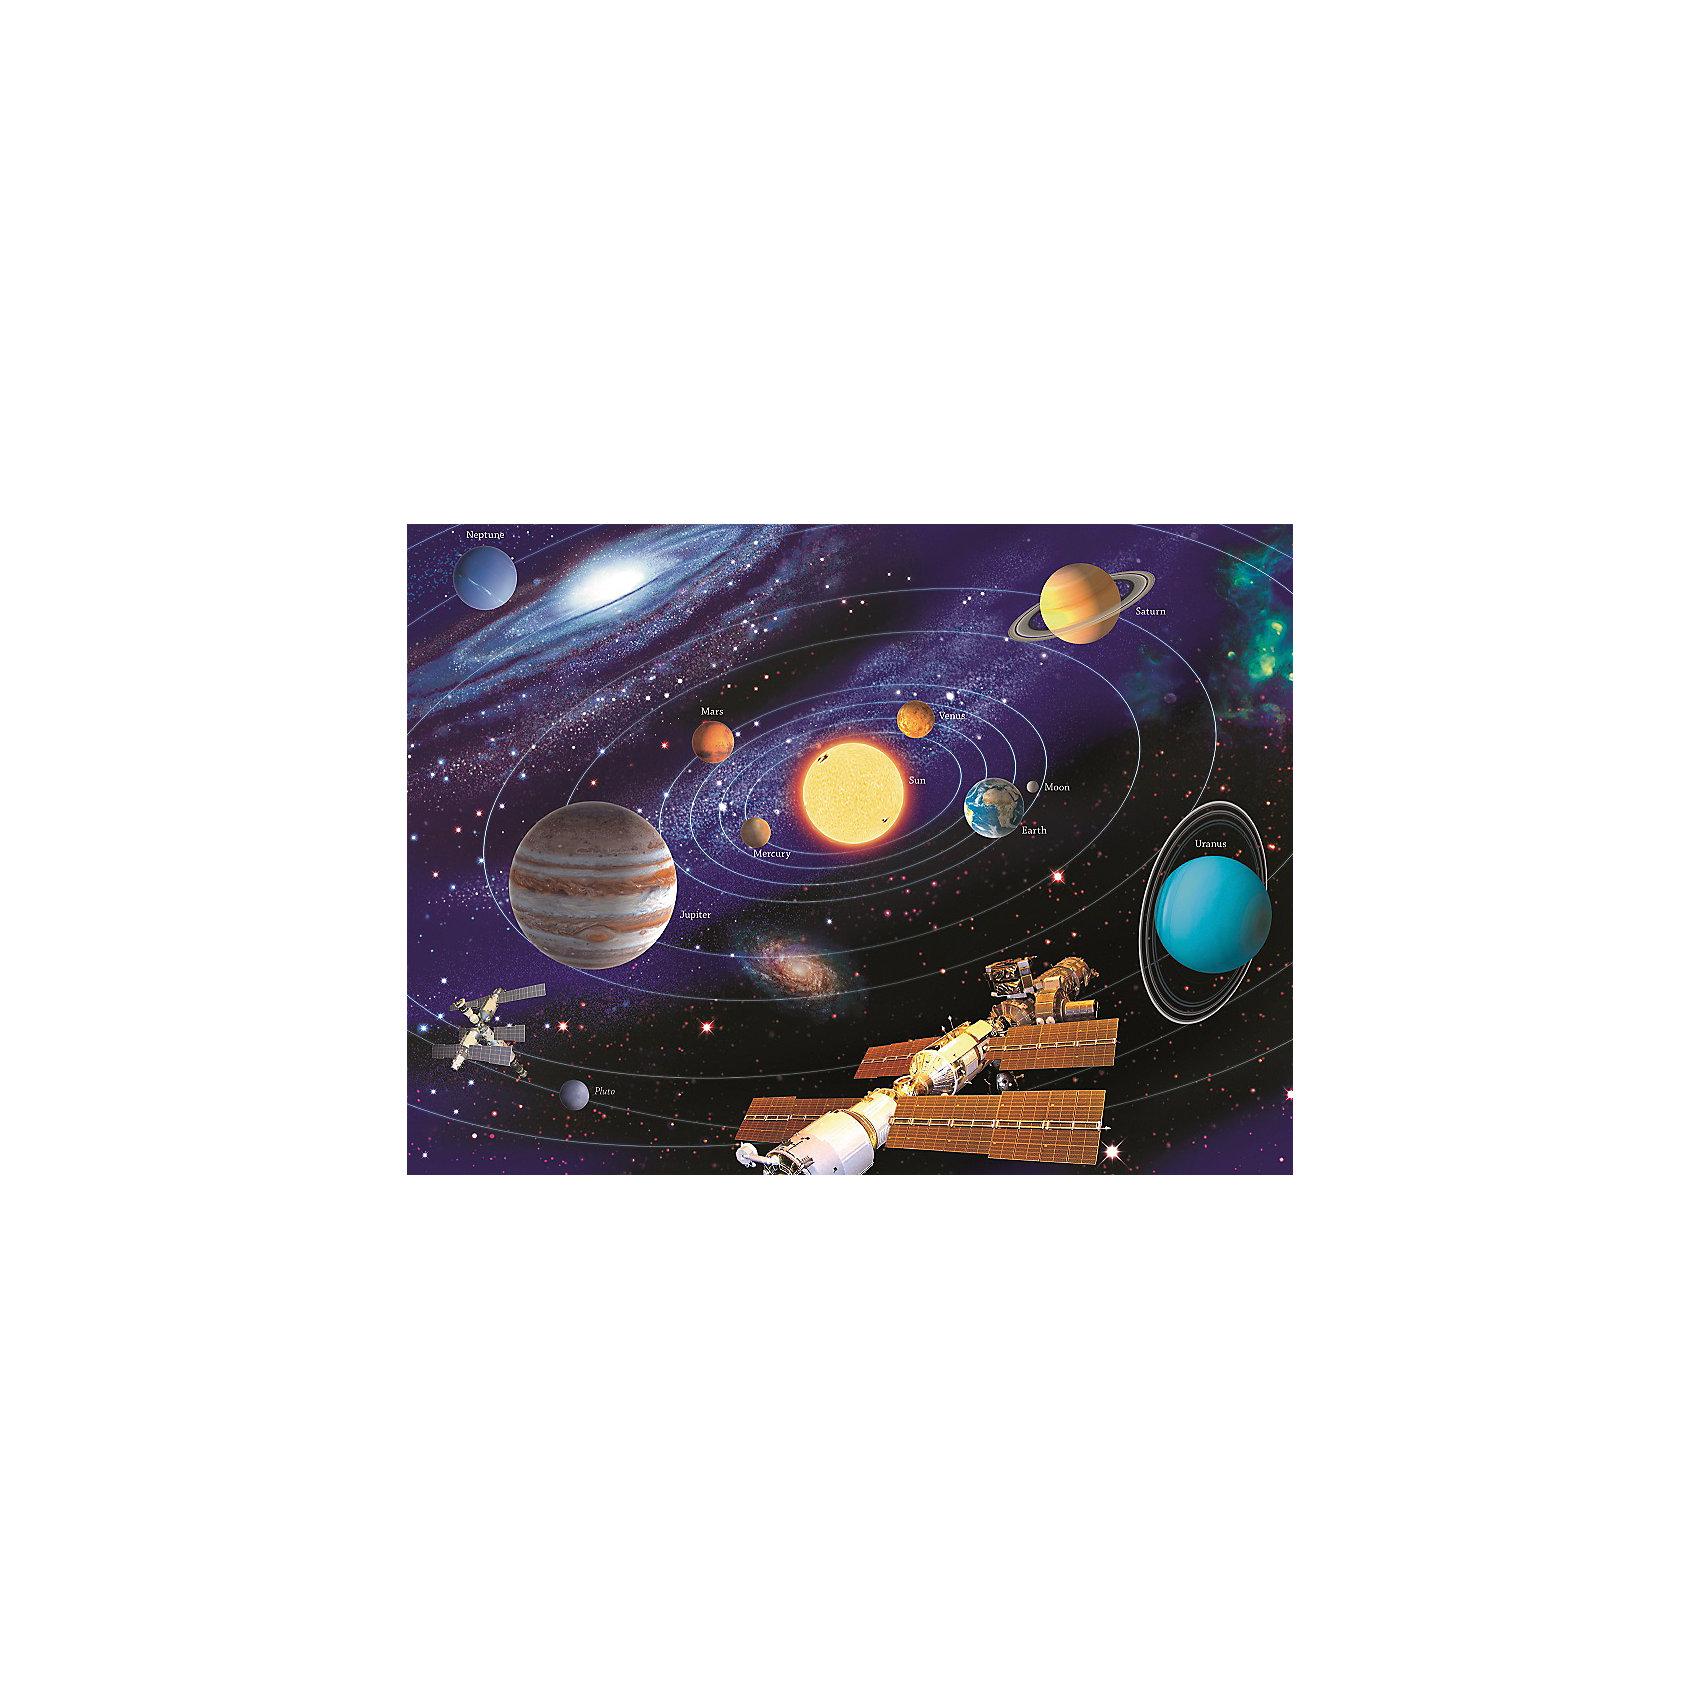 Ravensburger Пазл «Солнечная система» XXL 200 деталей, Ravensburger ravensburger пазл солнечная система xxl 200 деталей